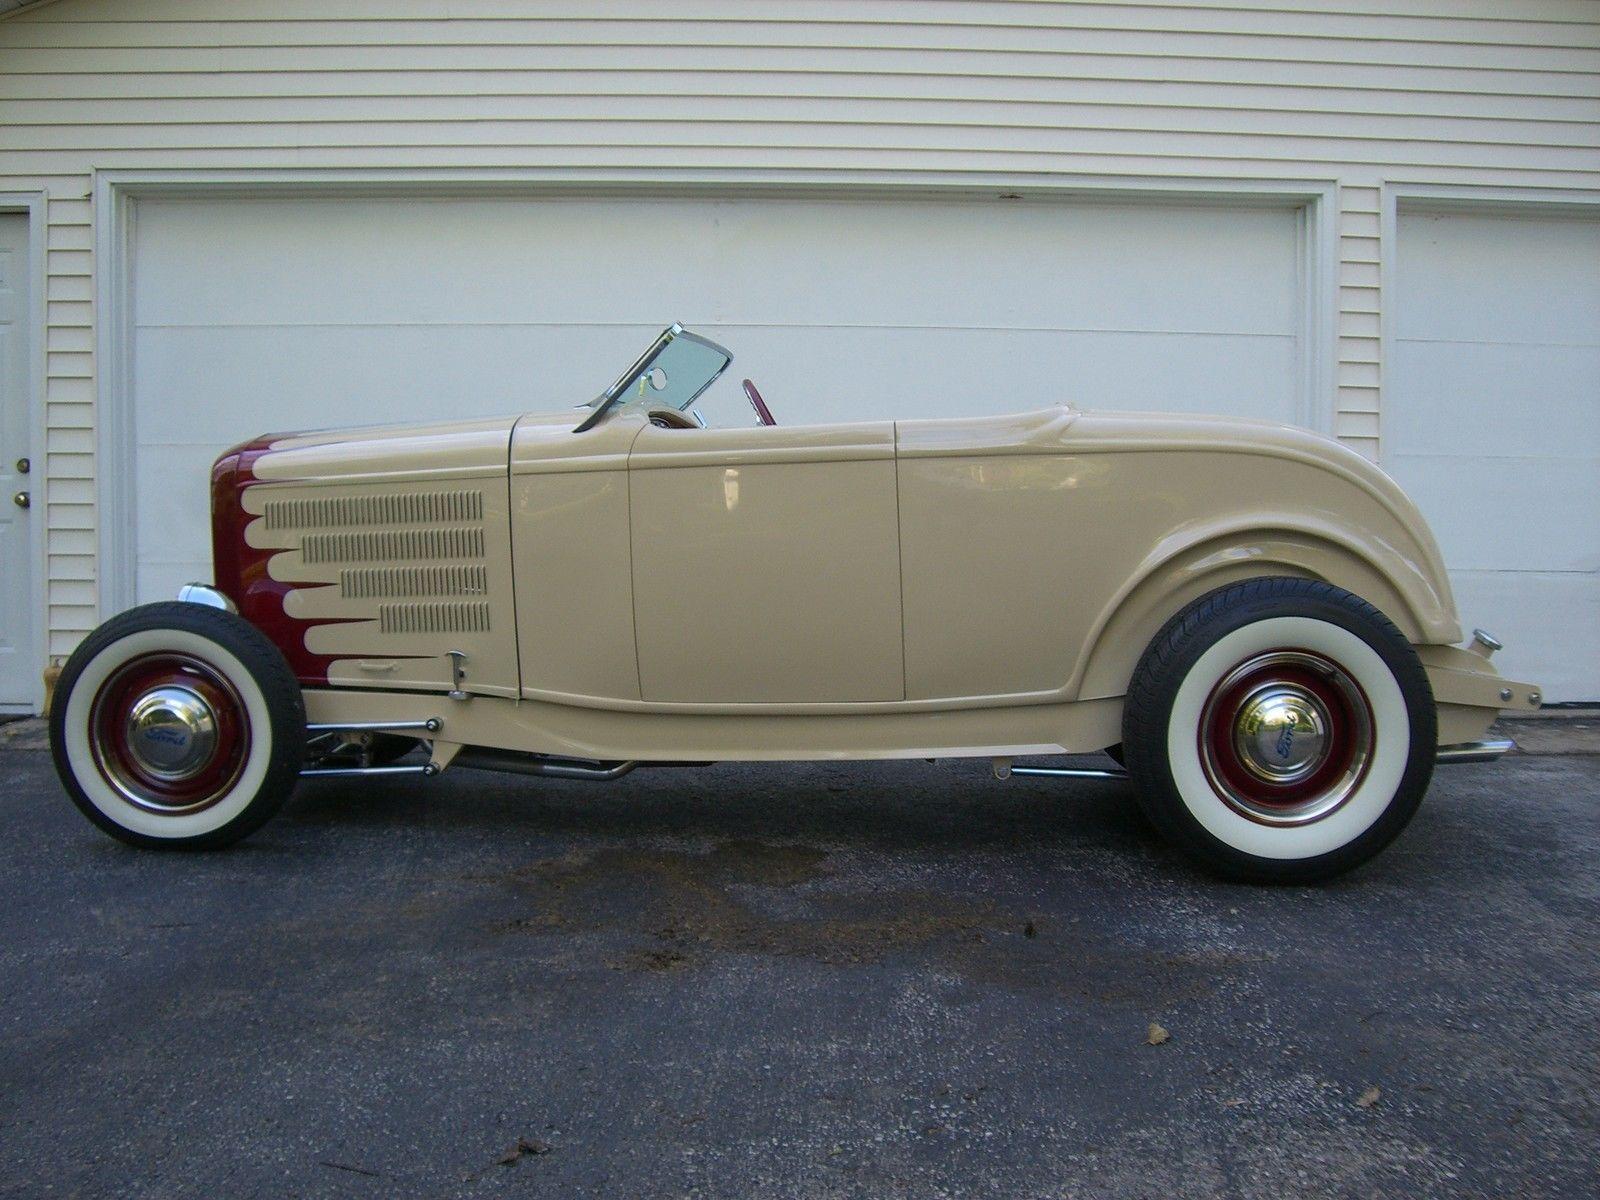 US $40,000.00 Used in eBay Motors, Cars & Trucks, Ford | Hot Rods ...